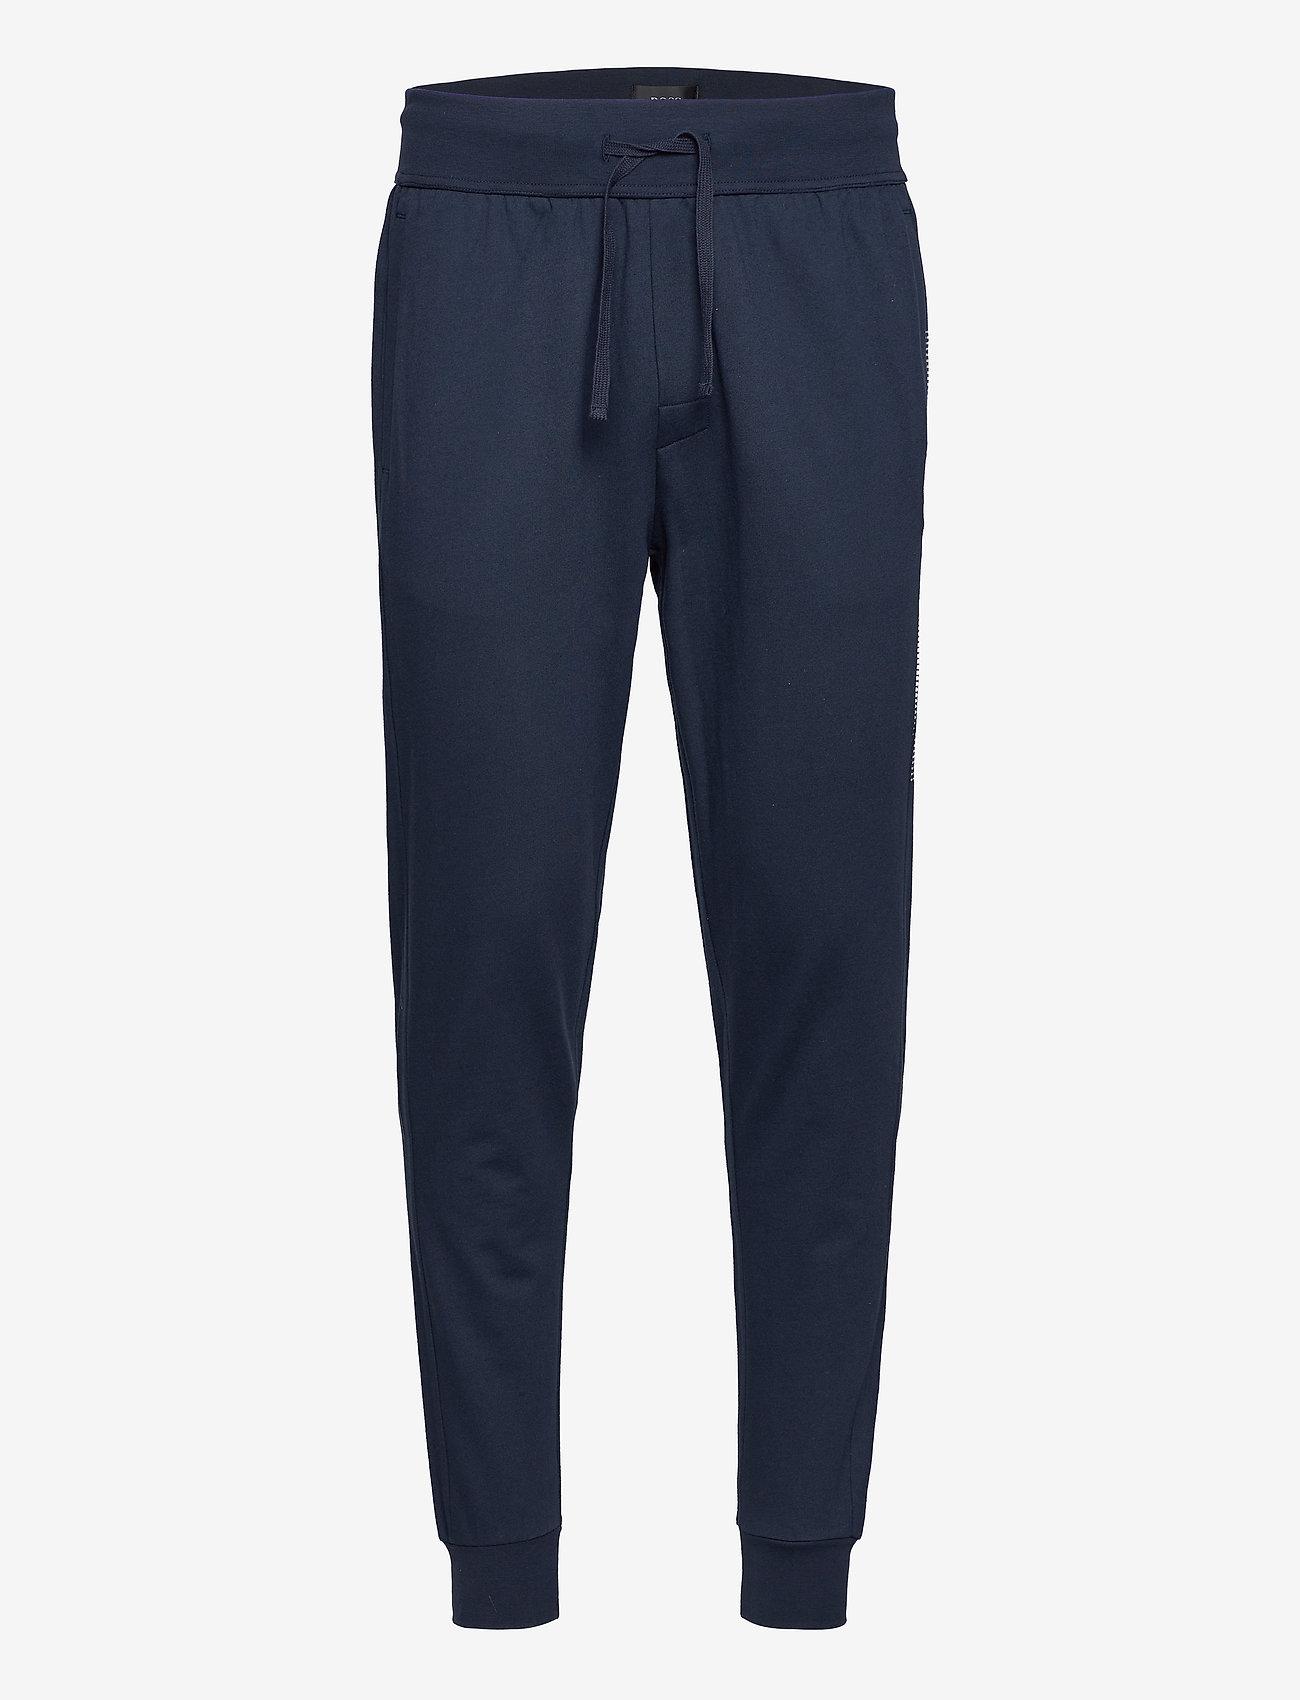 BOSS - Authentic Pants - bas de pyjama - dark blue - 0